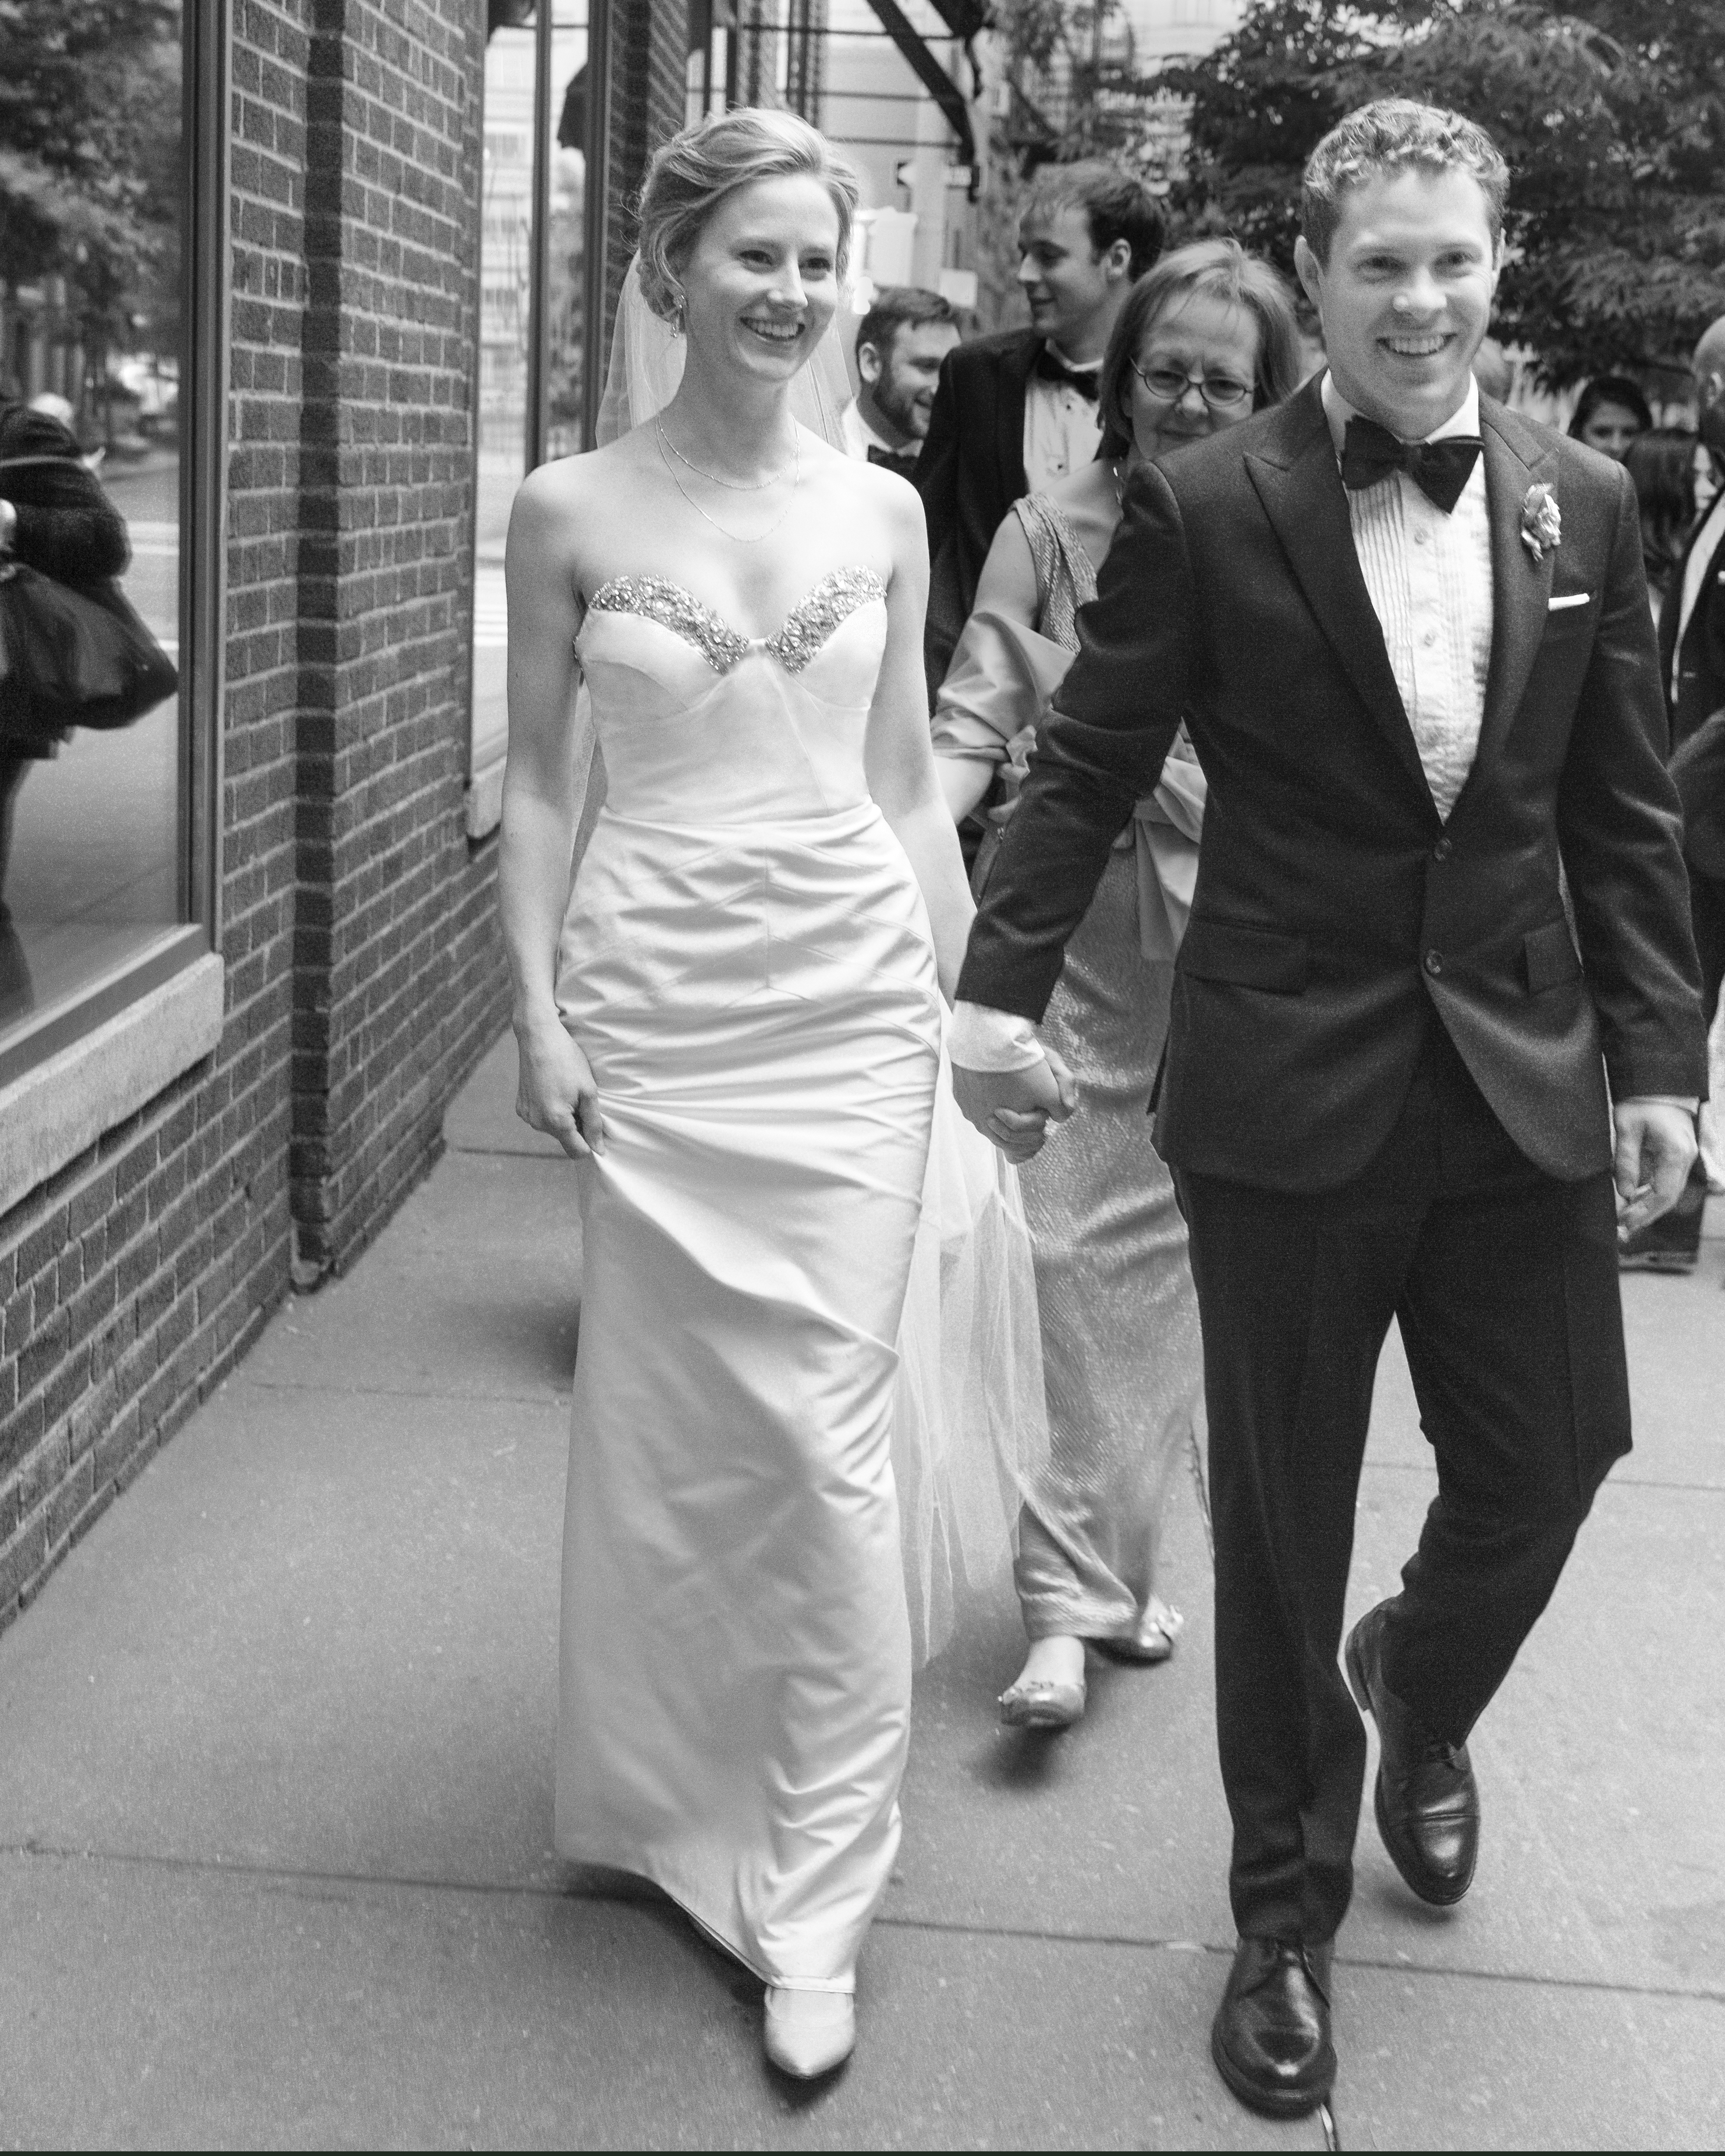 bride-groom-street-blake-chris-nyc-pi-5128-2-mwd110141.jpg